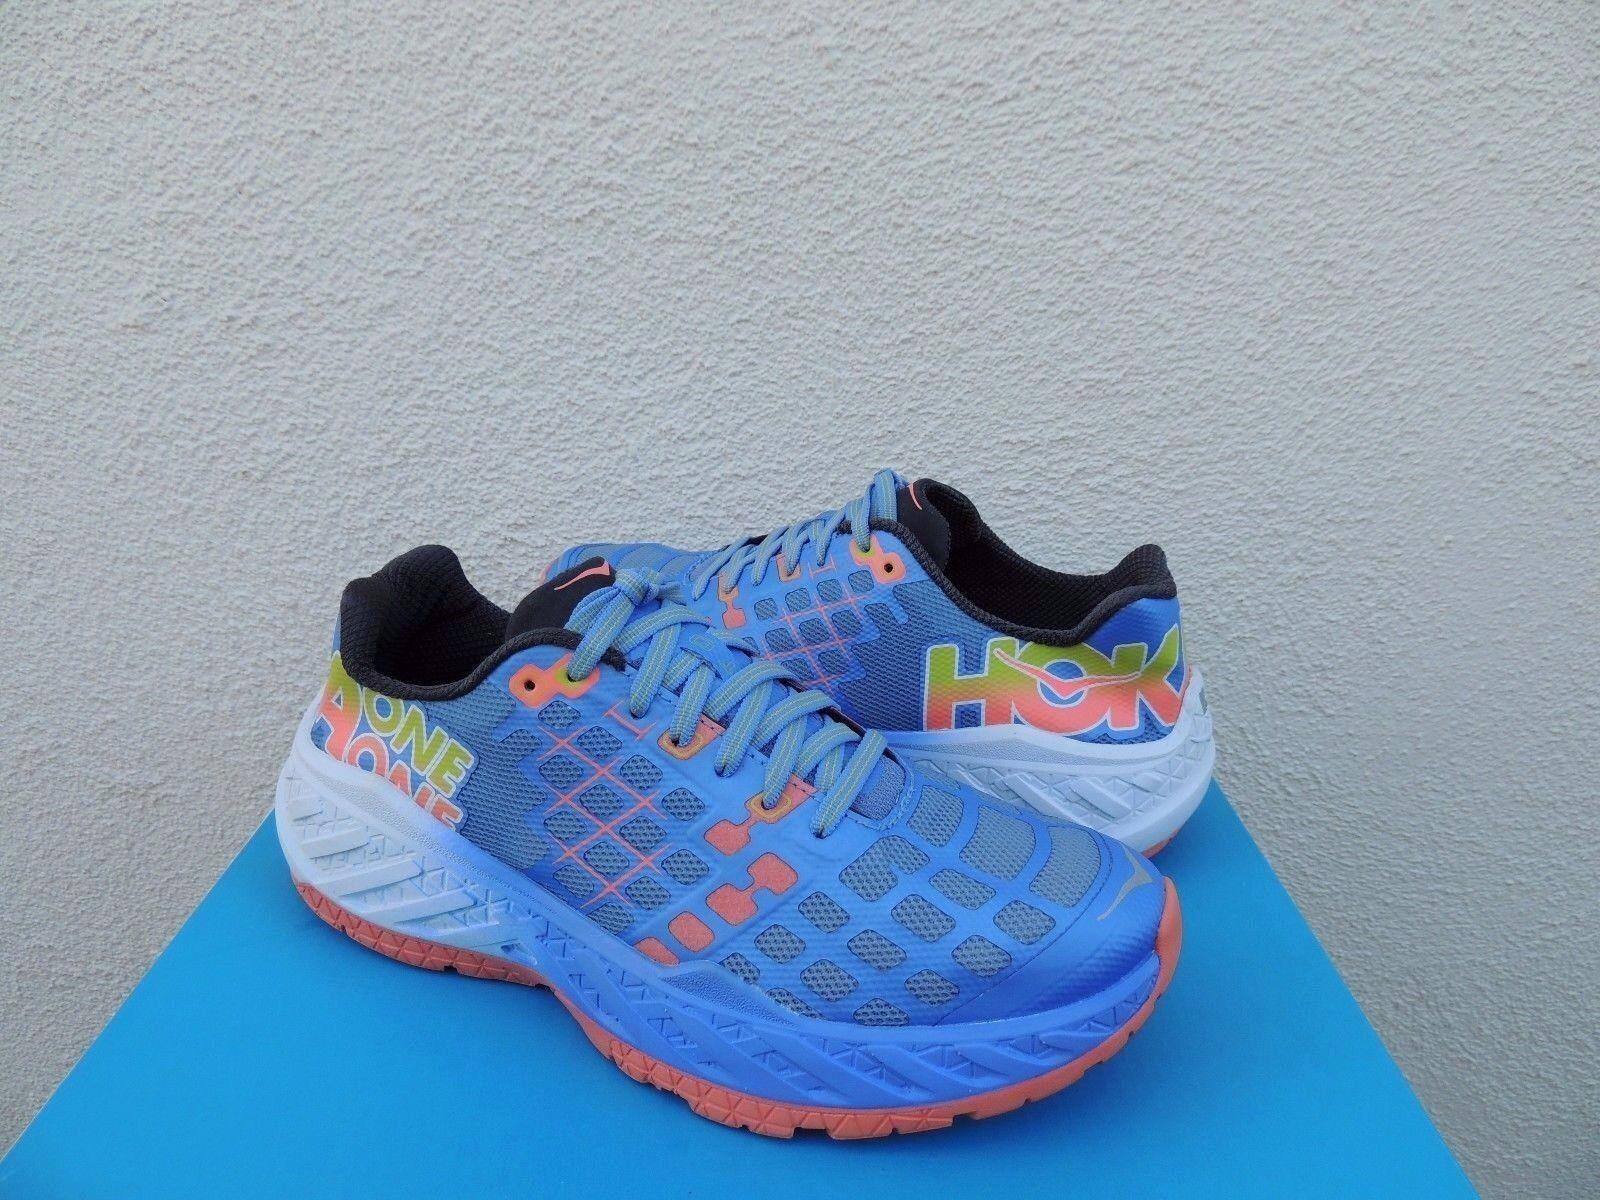 HOKA ONE ONE CLAYTON ULTRAMARINE ROAD RUNNING Chaussures, Femme US 5/ EUR 36 ~NIB